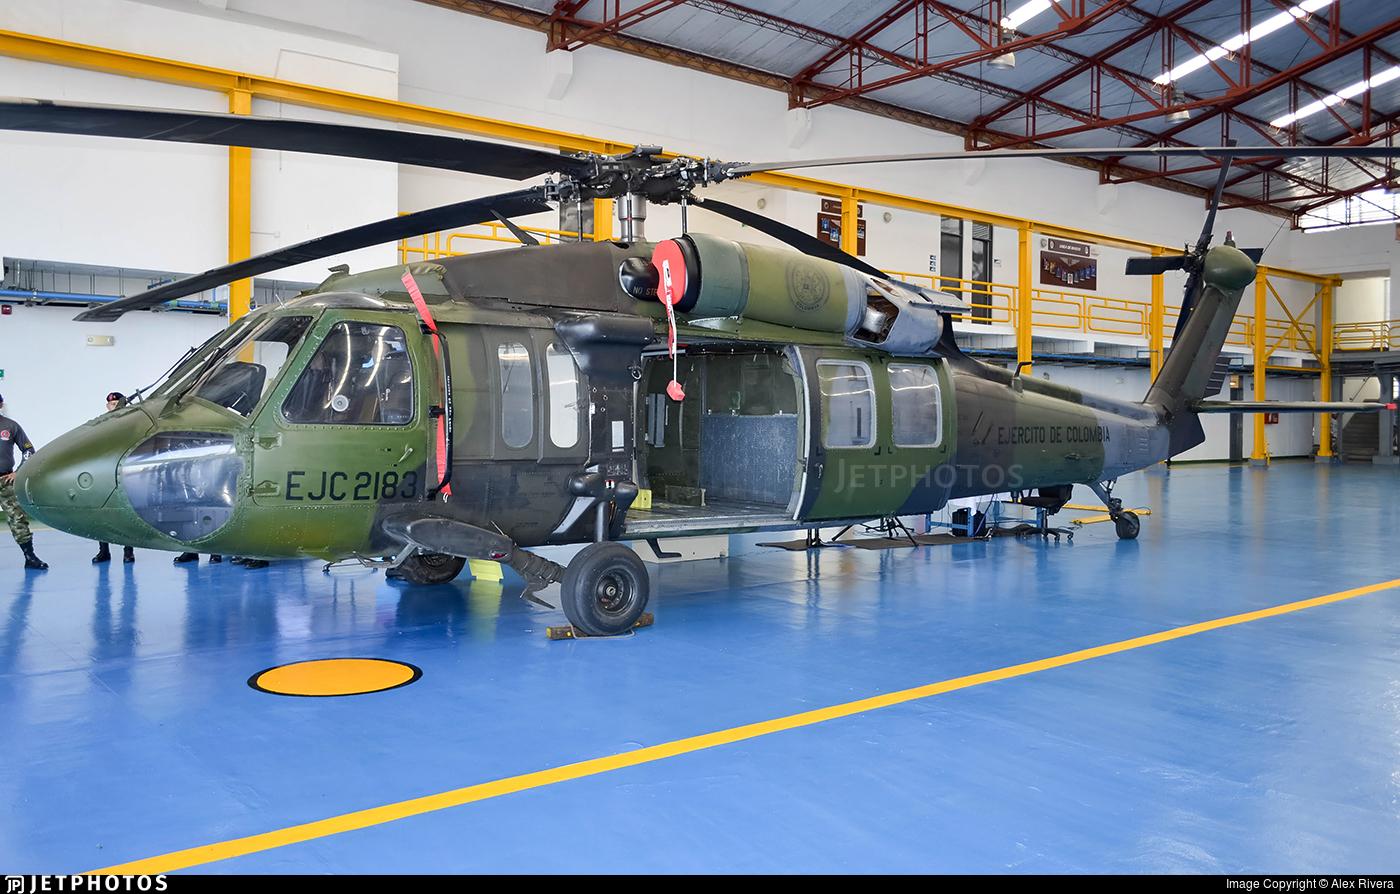 EJC2183 - Sikorsky UH-60L Blackhawk - Colombia - Army